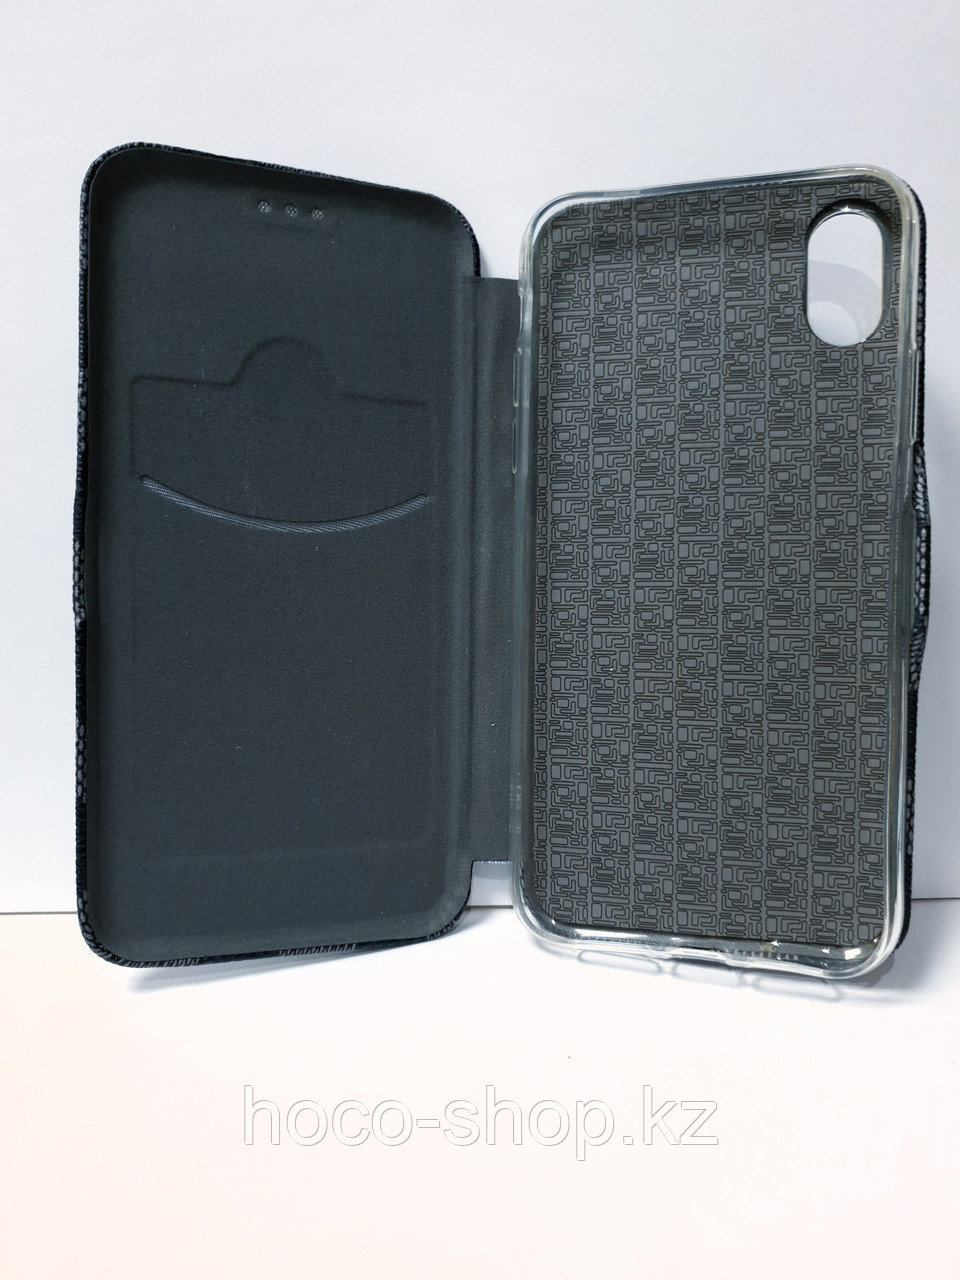 Кожаный чехол-книжка Louis Vuitton iPhone Xs Max - фото 2